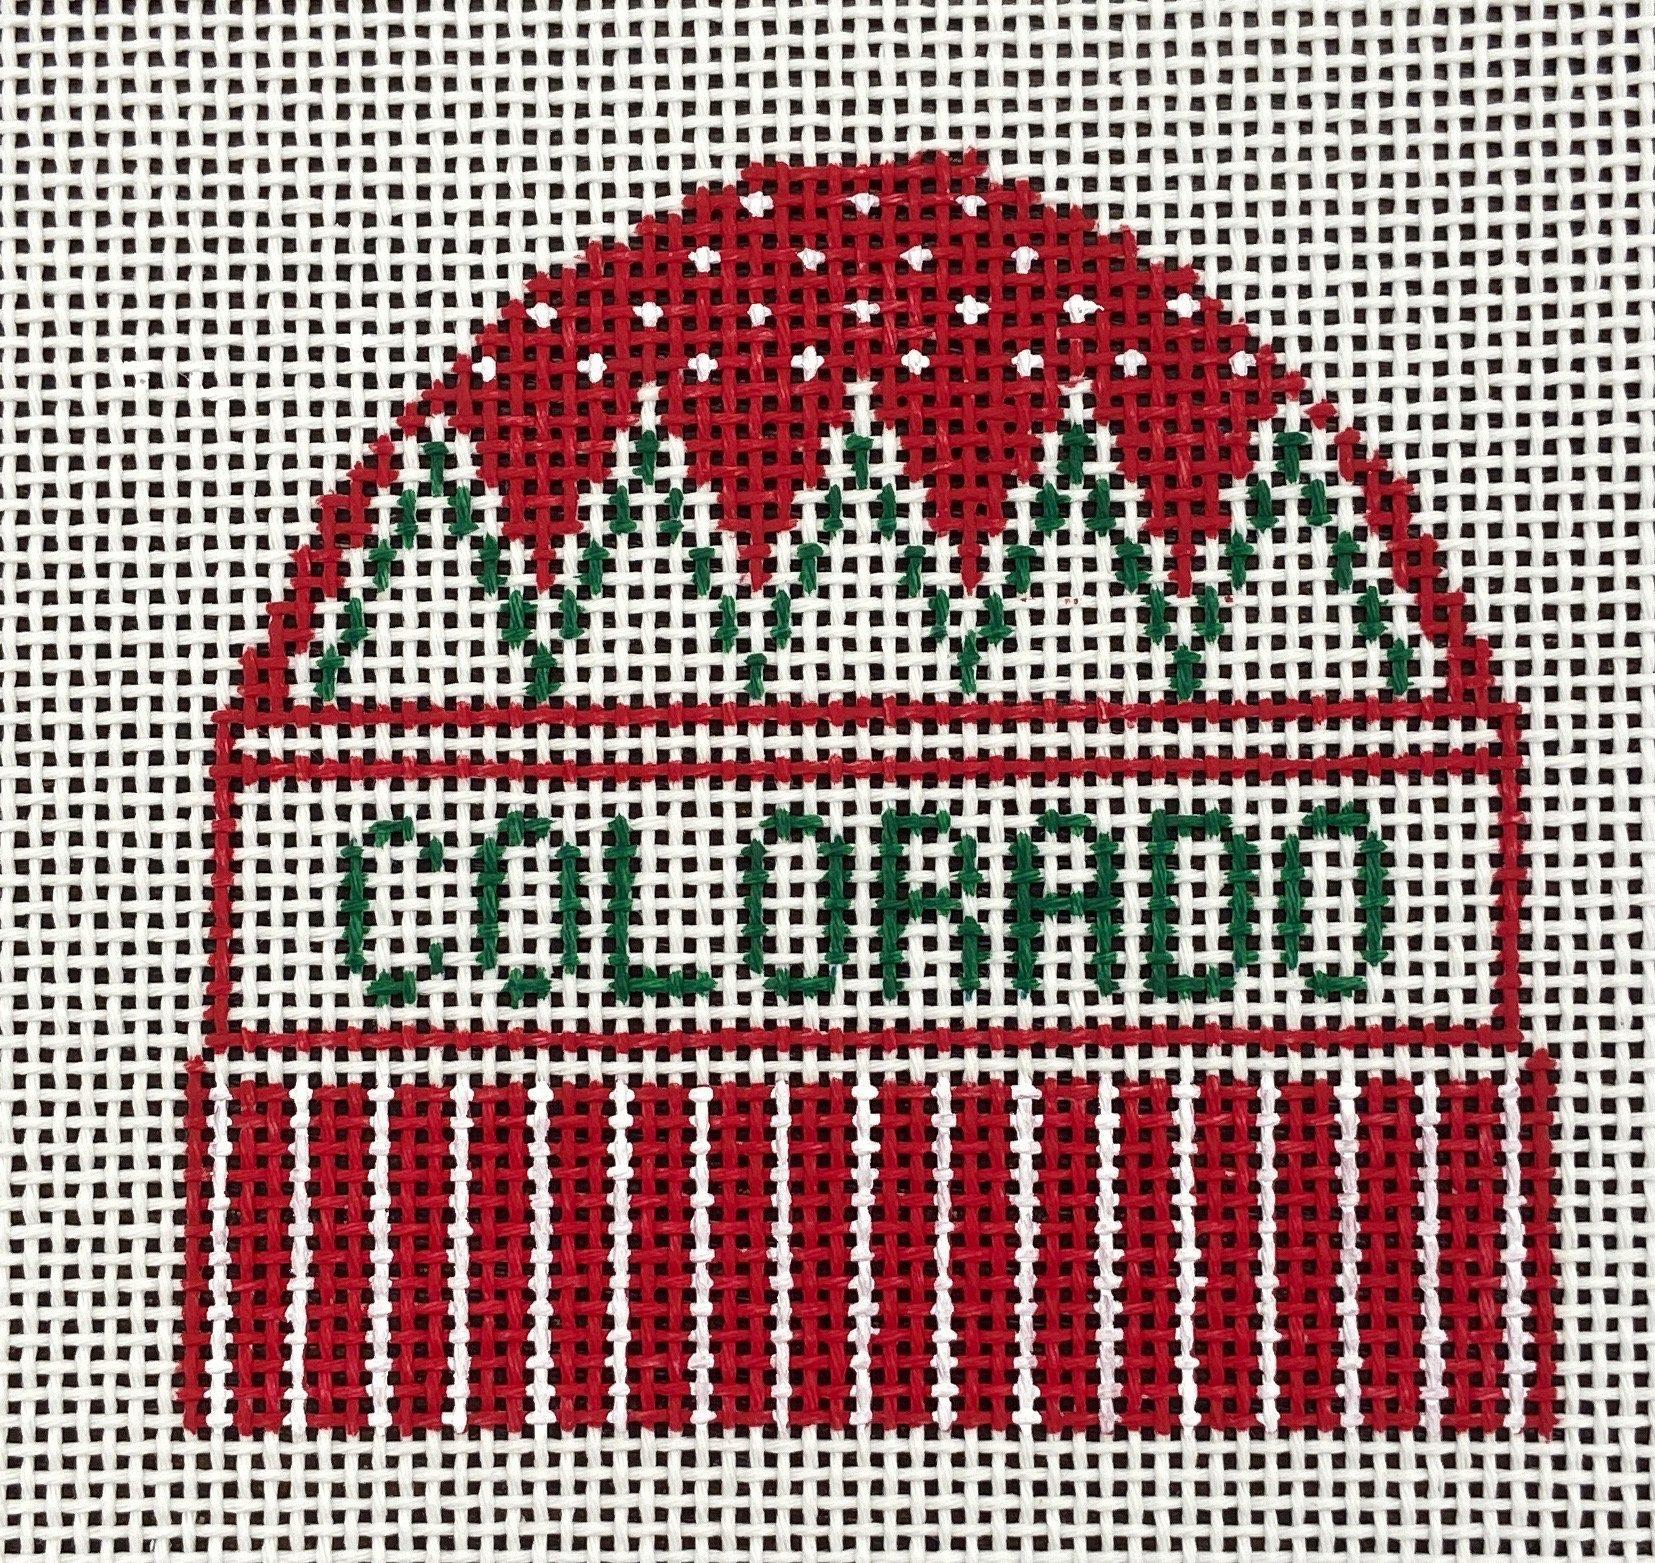 H202 Colorado Knit Cap Dootlittle Stitchery